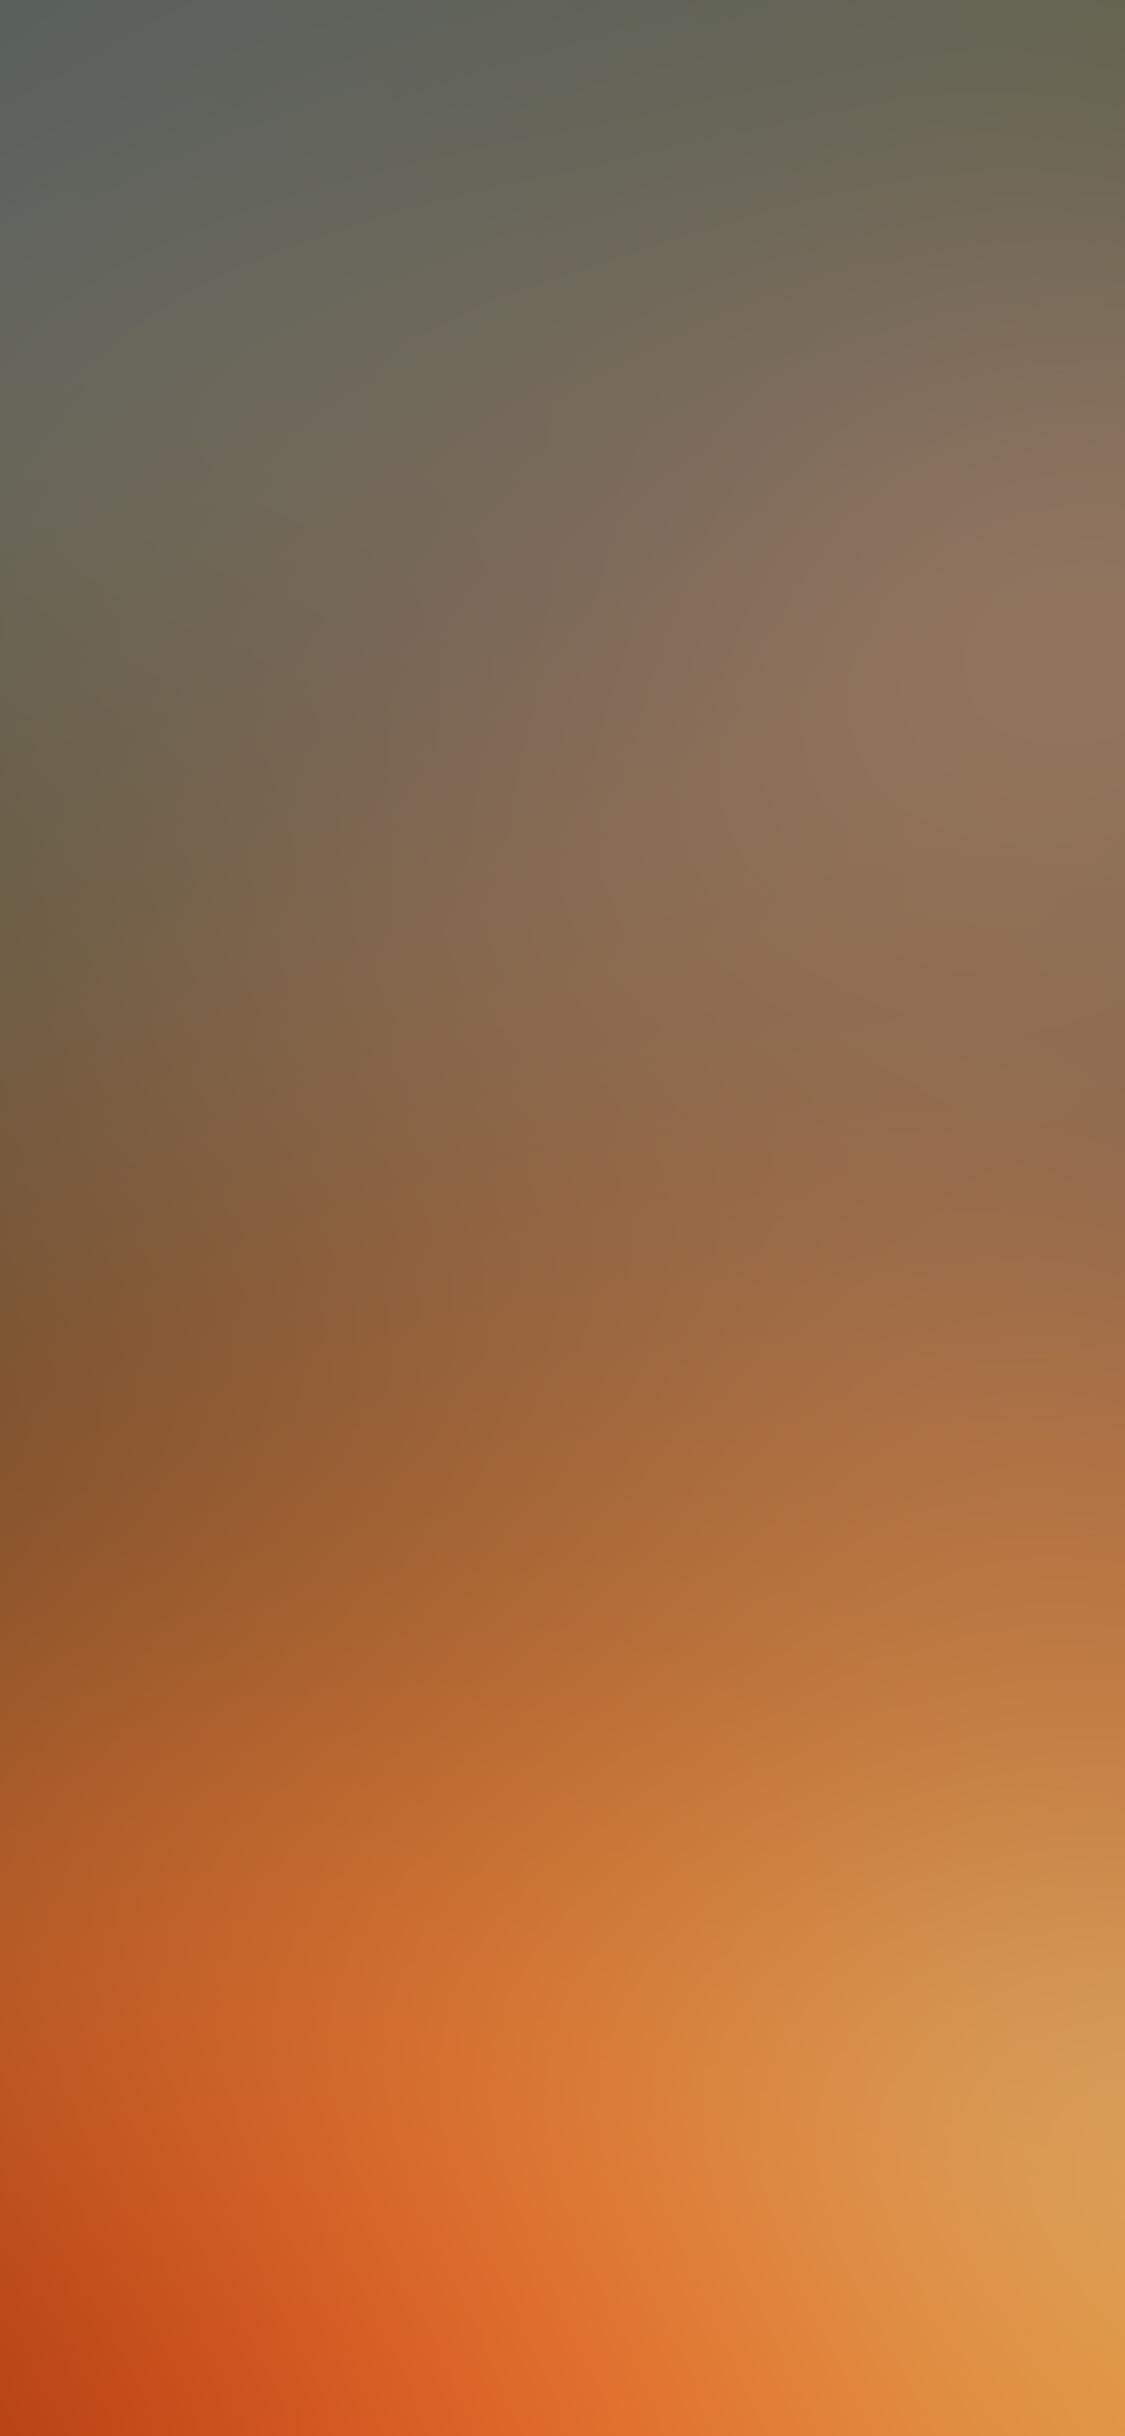 iPhonexpapers.com-Apple-iPhone-wallpaper-sn51-gold-sunset-blur-gradation